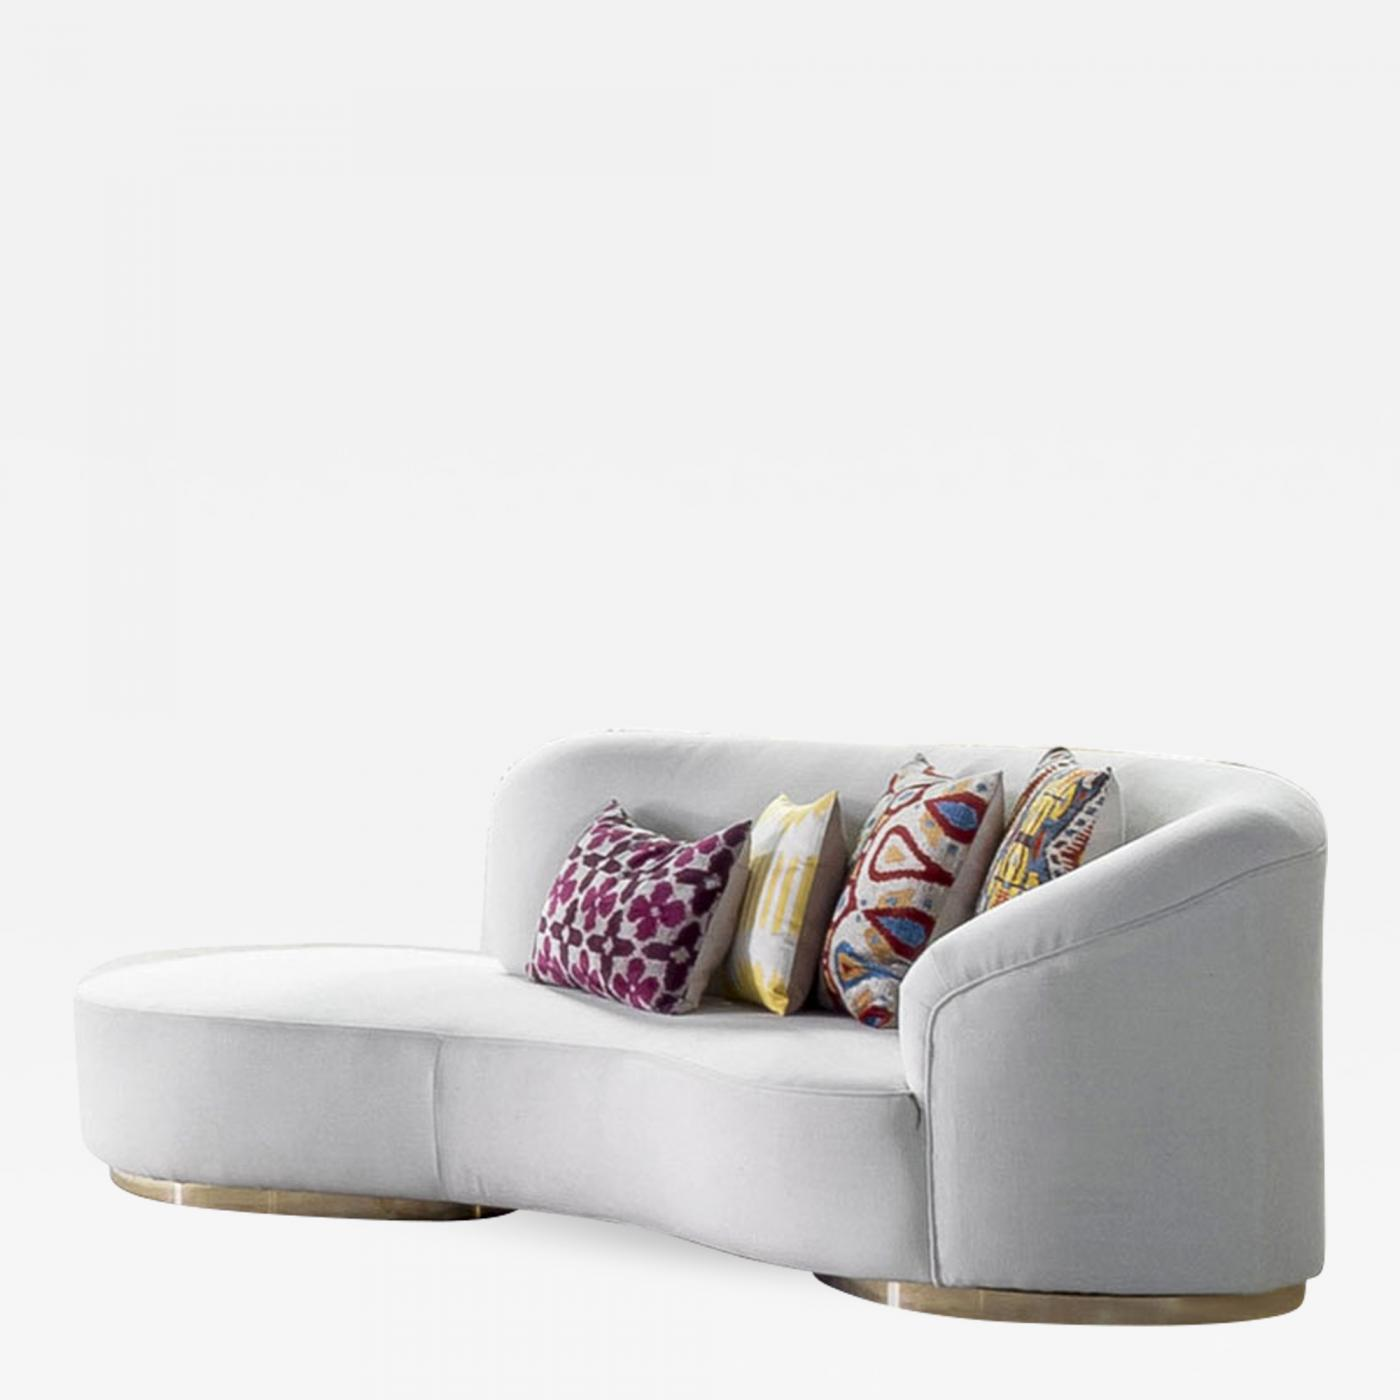 Phenomenal Contemporary Curved White Linen And Brass Italian Sofa Dailytribune Chair Design For Home Dailytribuneorg